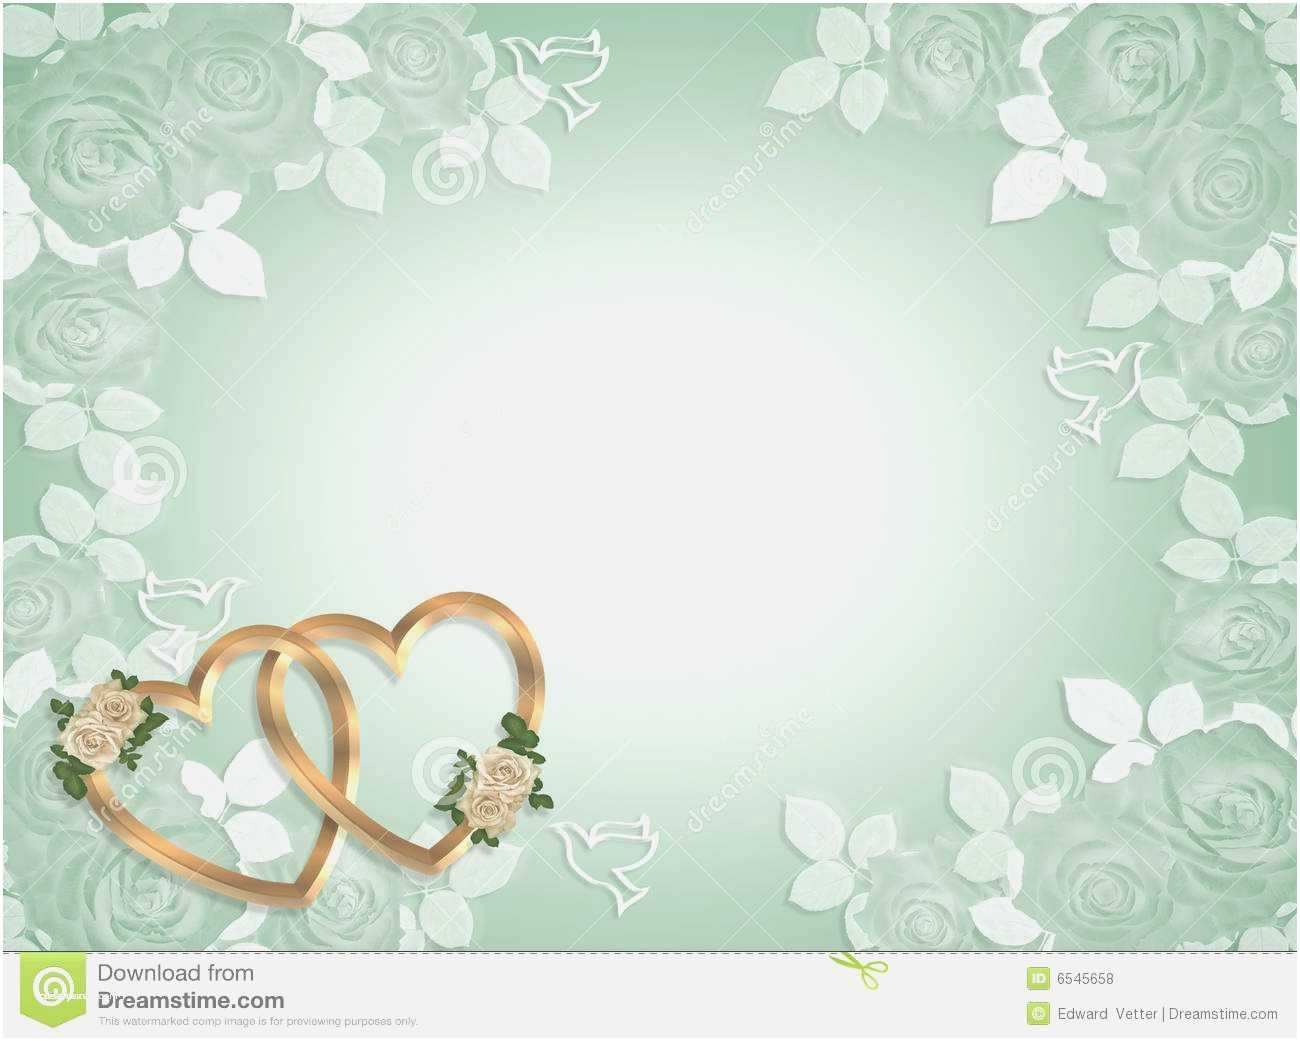 Wholesale Wedding Invitation Albums New Blank Vintage Wedding Invitation Templates